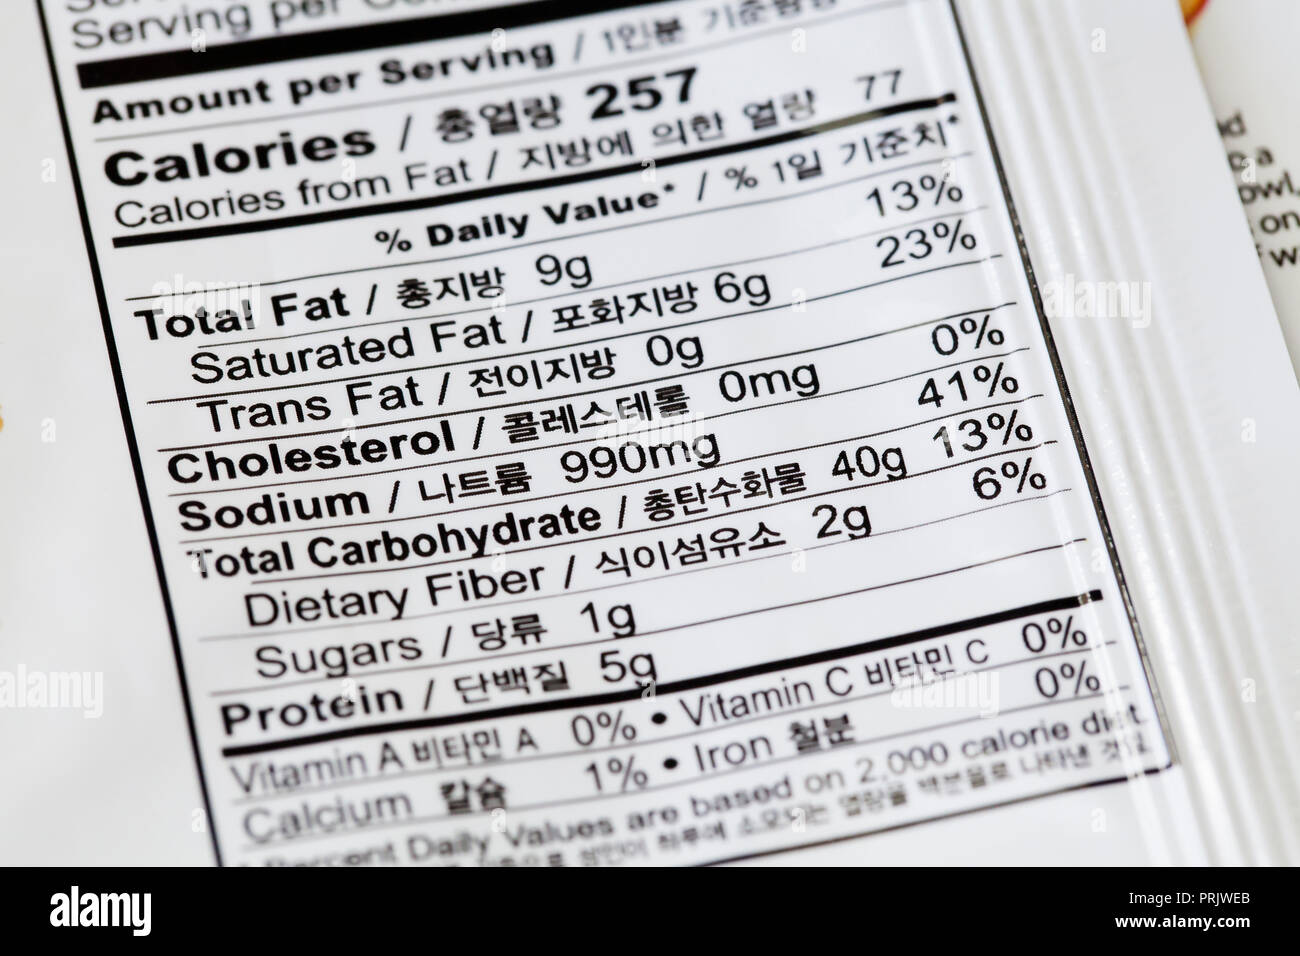 nutrition facts label on korean ramen noodles package (high